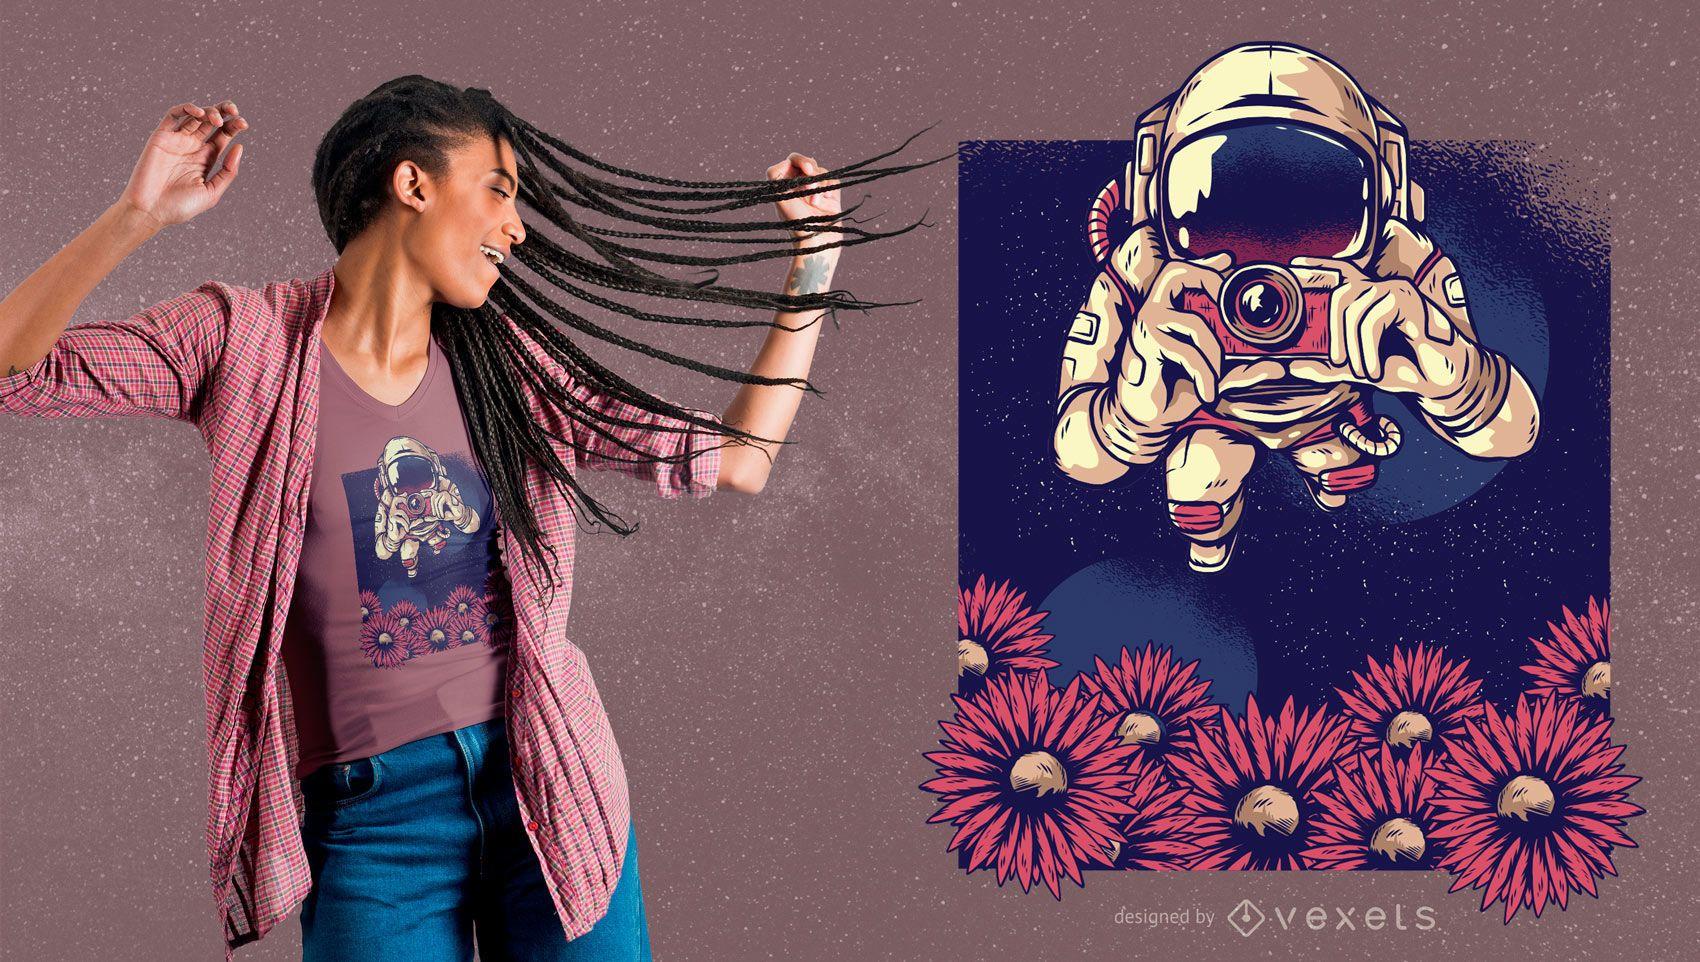 Dise?o de camiseta de fot?grafo astronauta floral